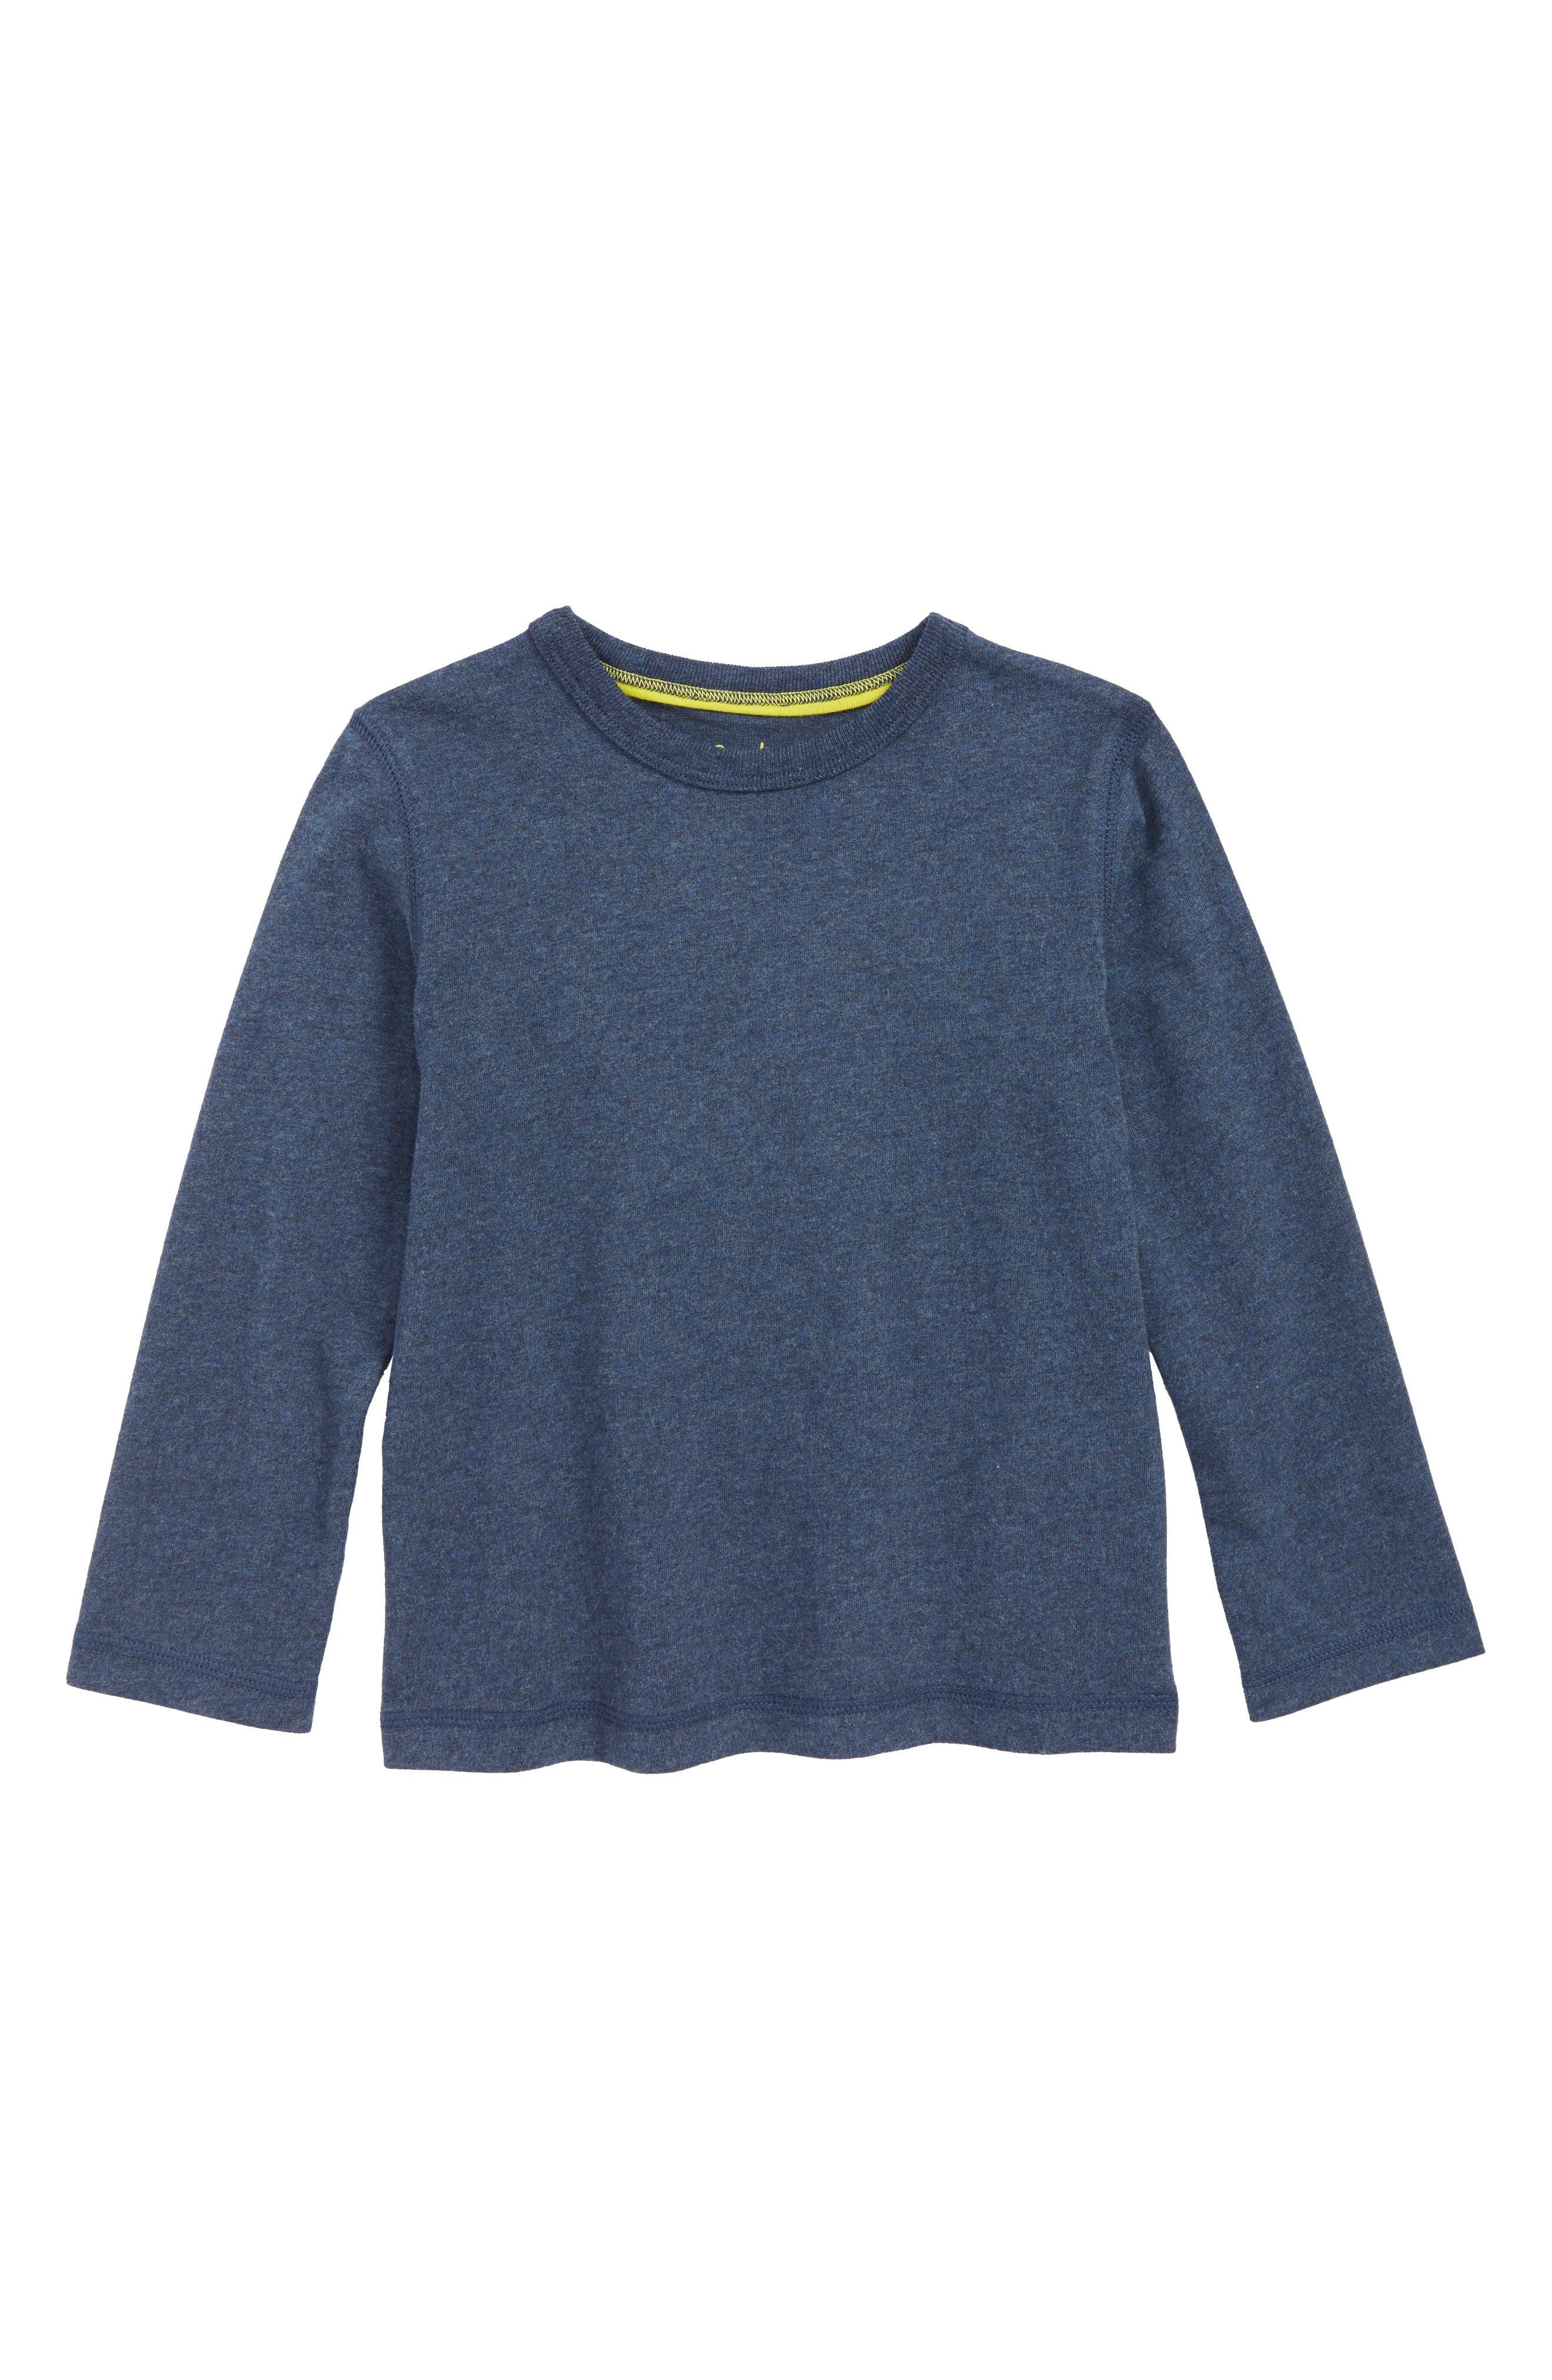 Supersoft Long Sleeve T-Shirt,                         Main,                         color, NAVY MARL